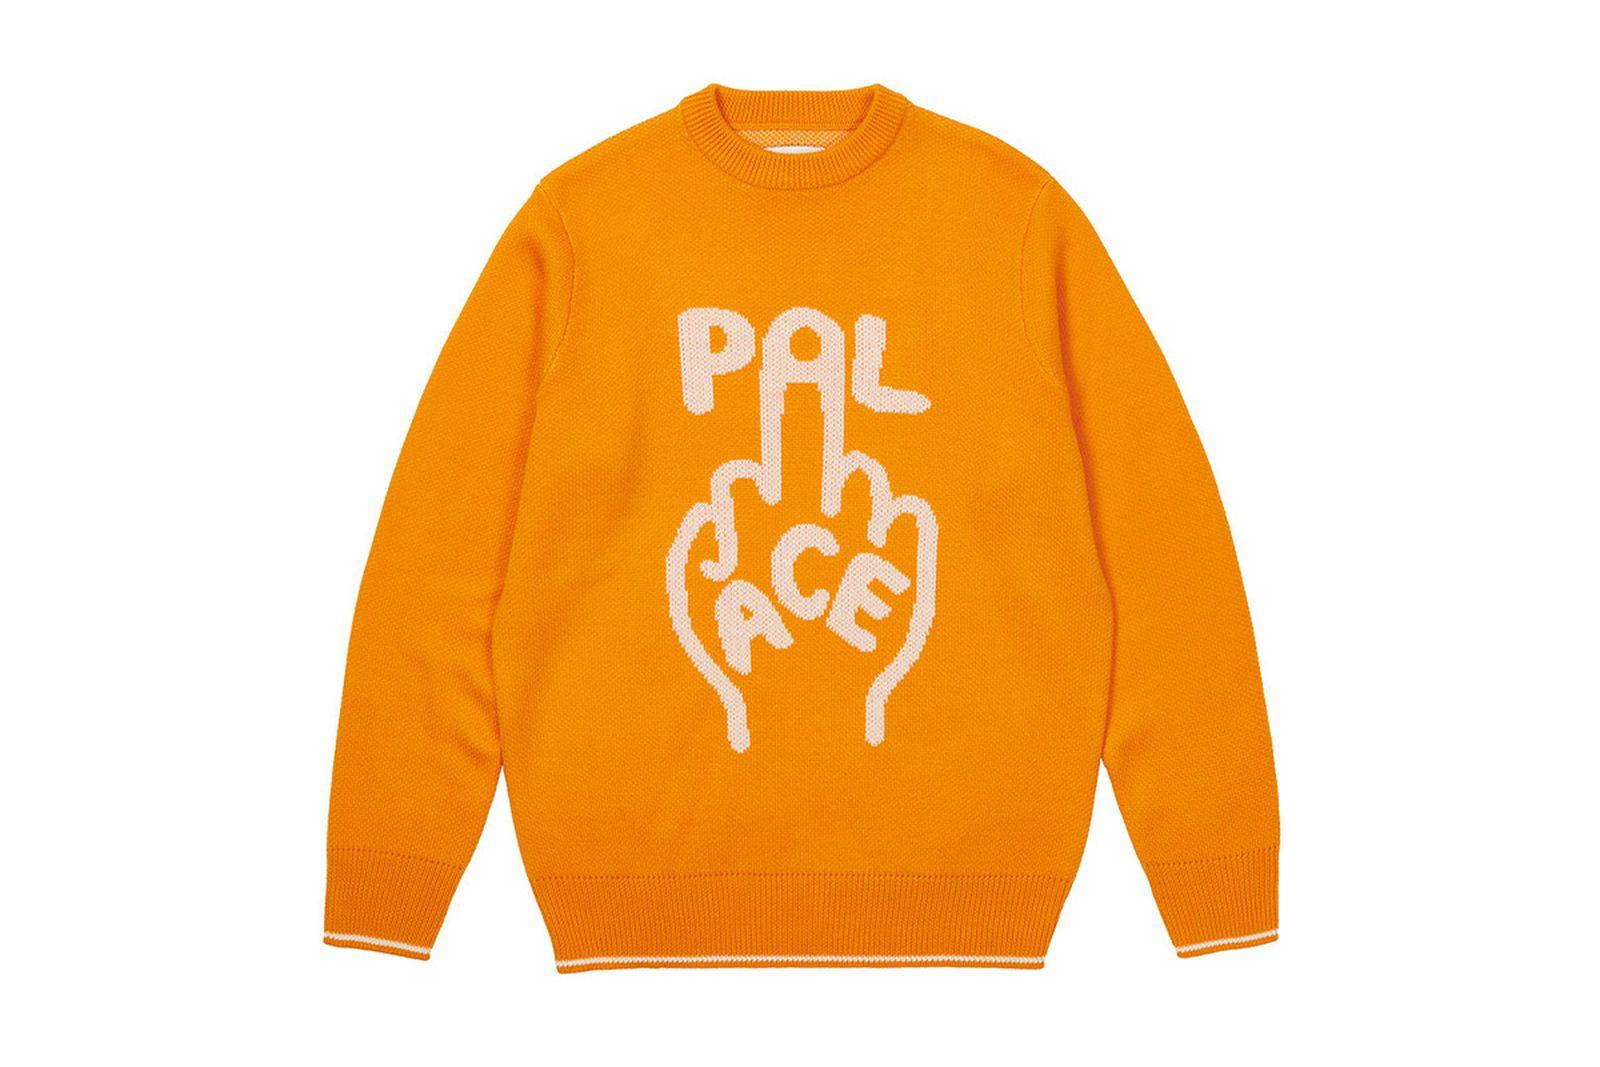 palace-crocs-classic-clog-release-date-price-22